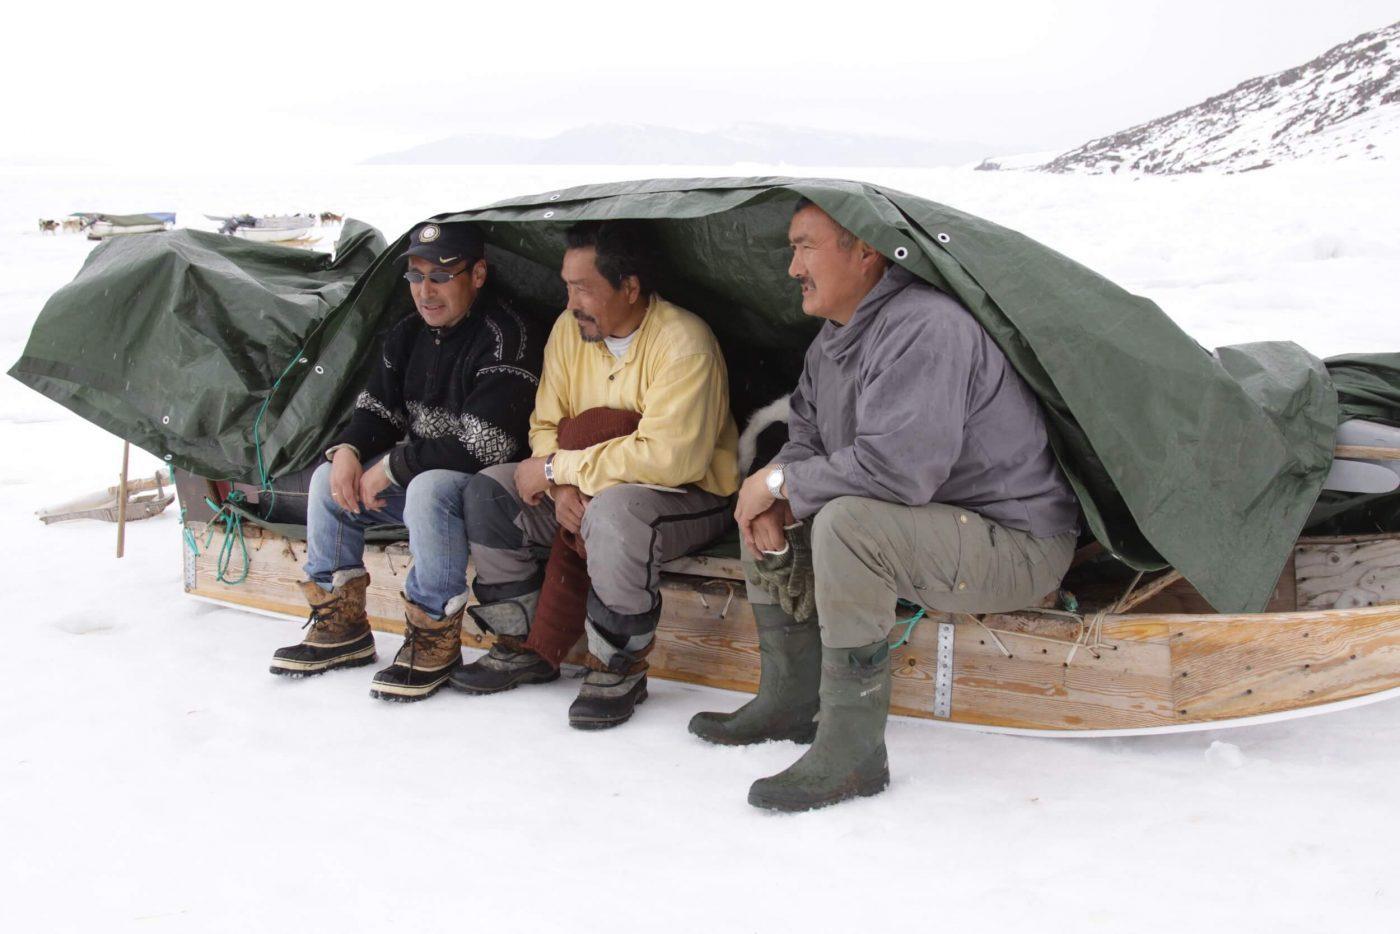 Three local men sitting on a sleigh under a tarpaulin in Qaanaaq, North Greenland. Photo by Nunataq Atsuk Travel